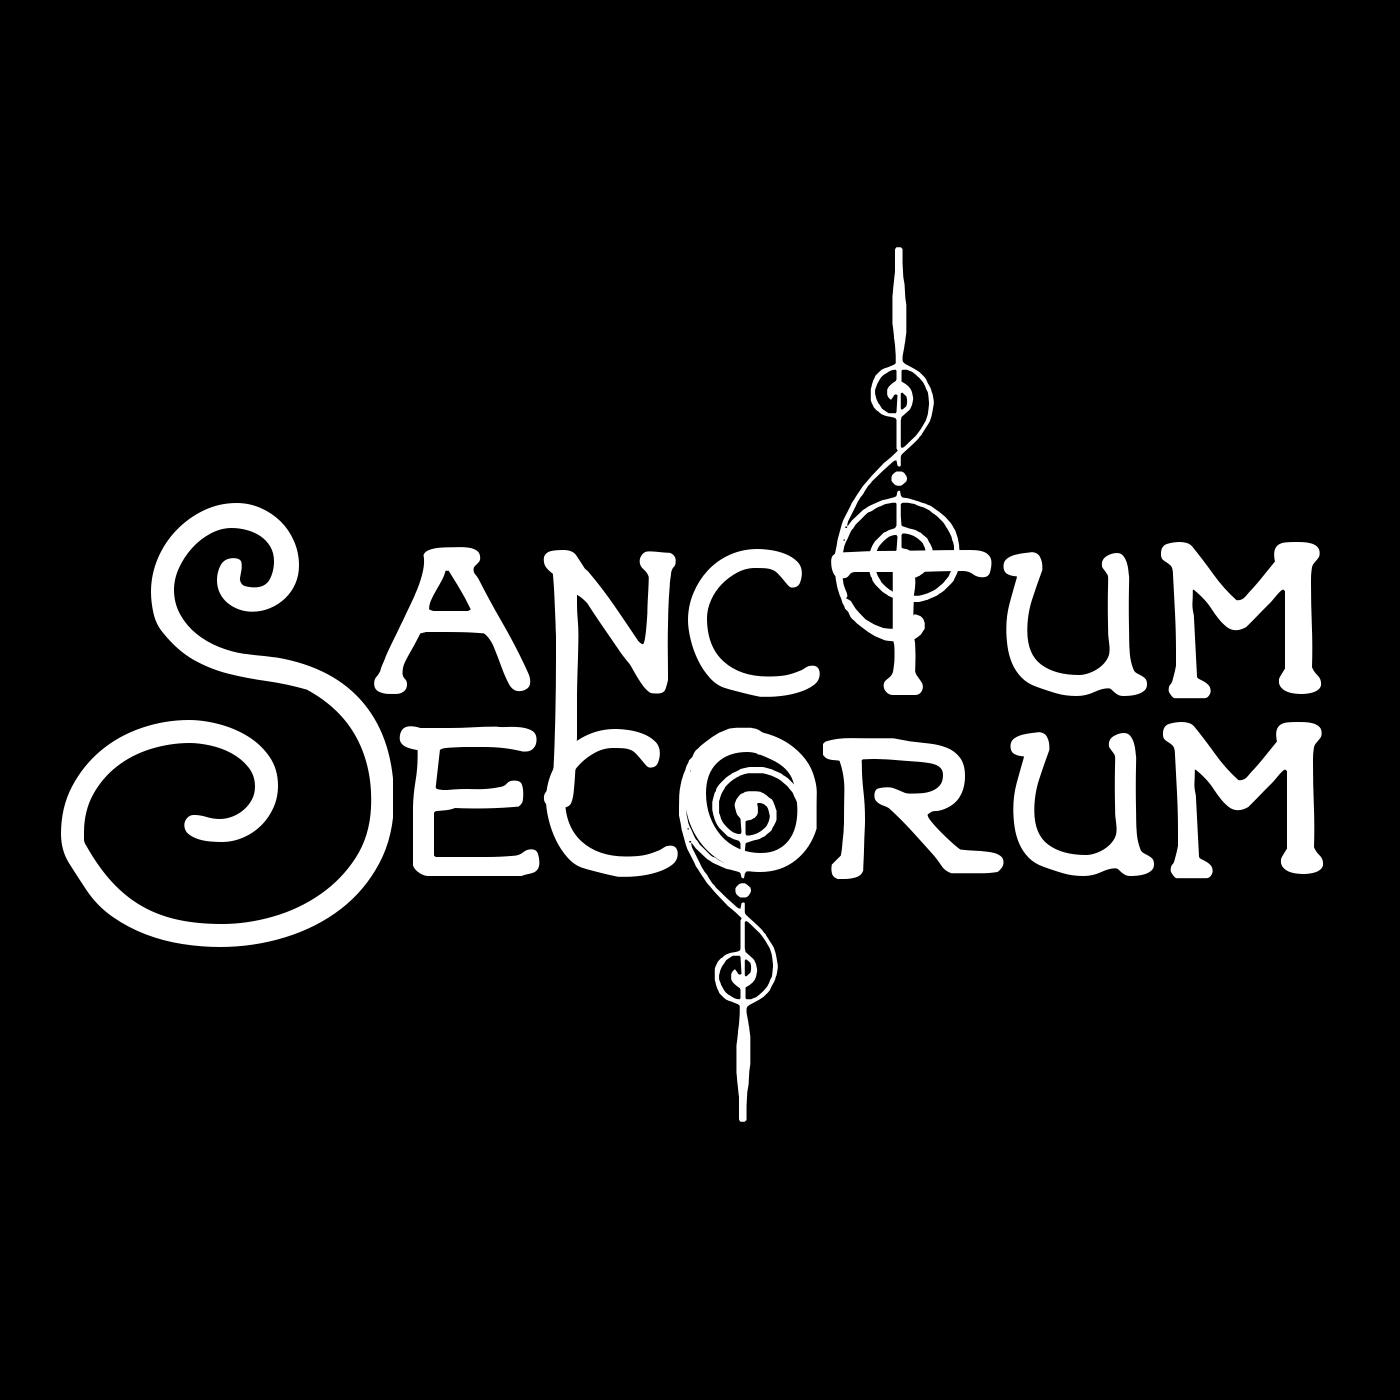 Sanctum Secorum #17 - A Night in the Lonesome October